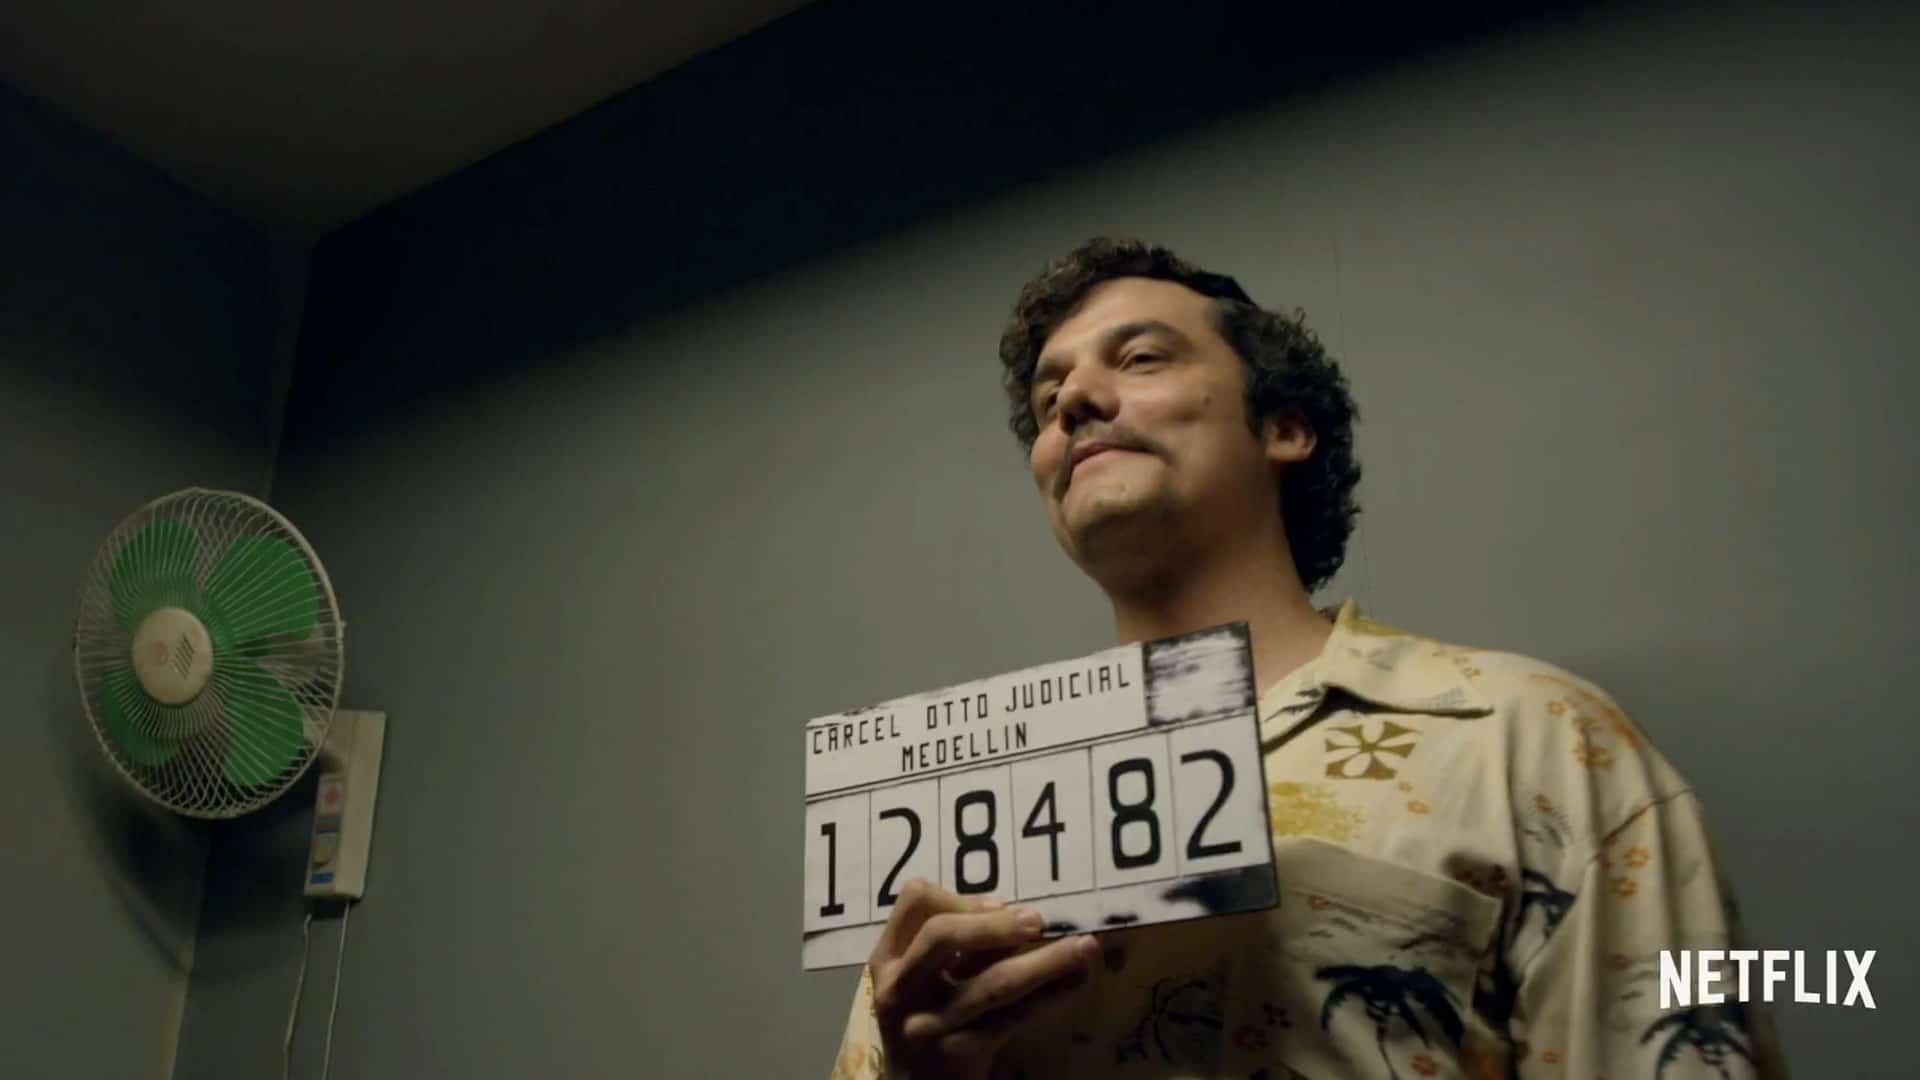 Pablo Escobar Quotes Wallpaper Narcos Il Fratello Di Pablo Escobar Fa Causa A Netflix